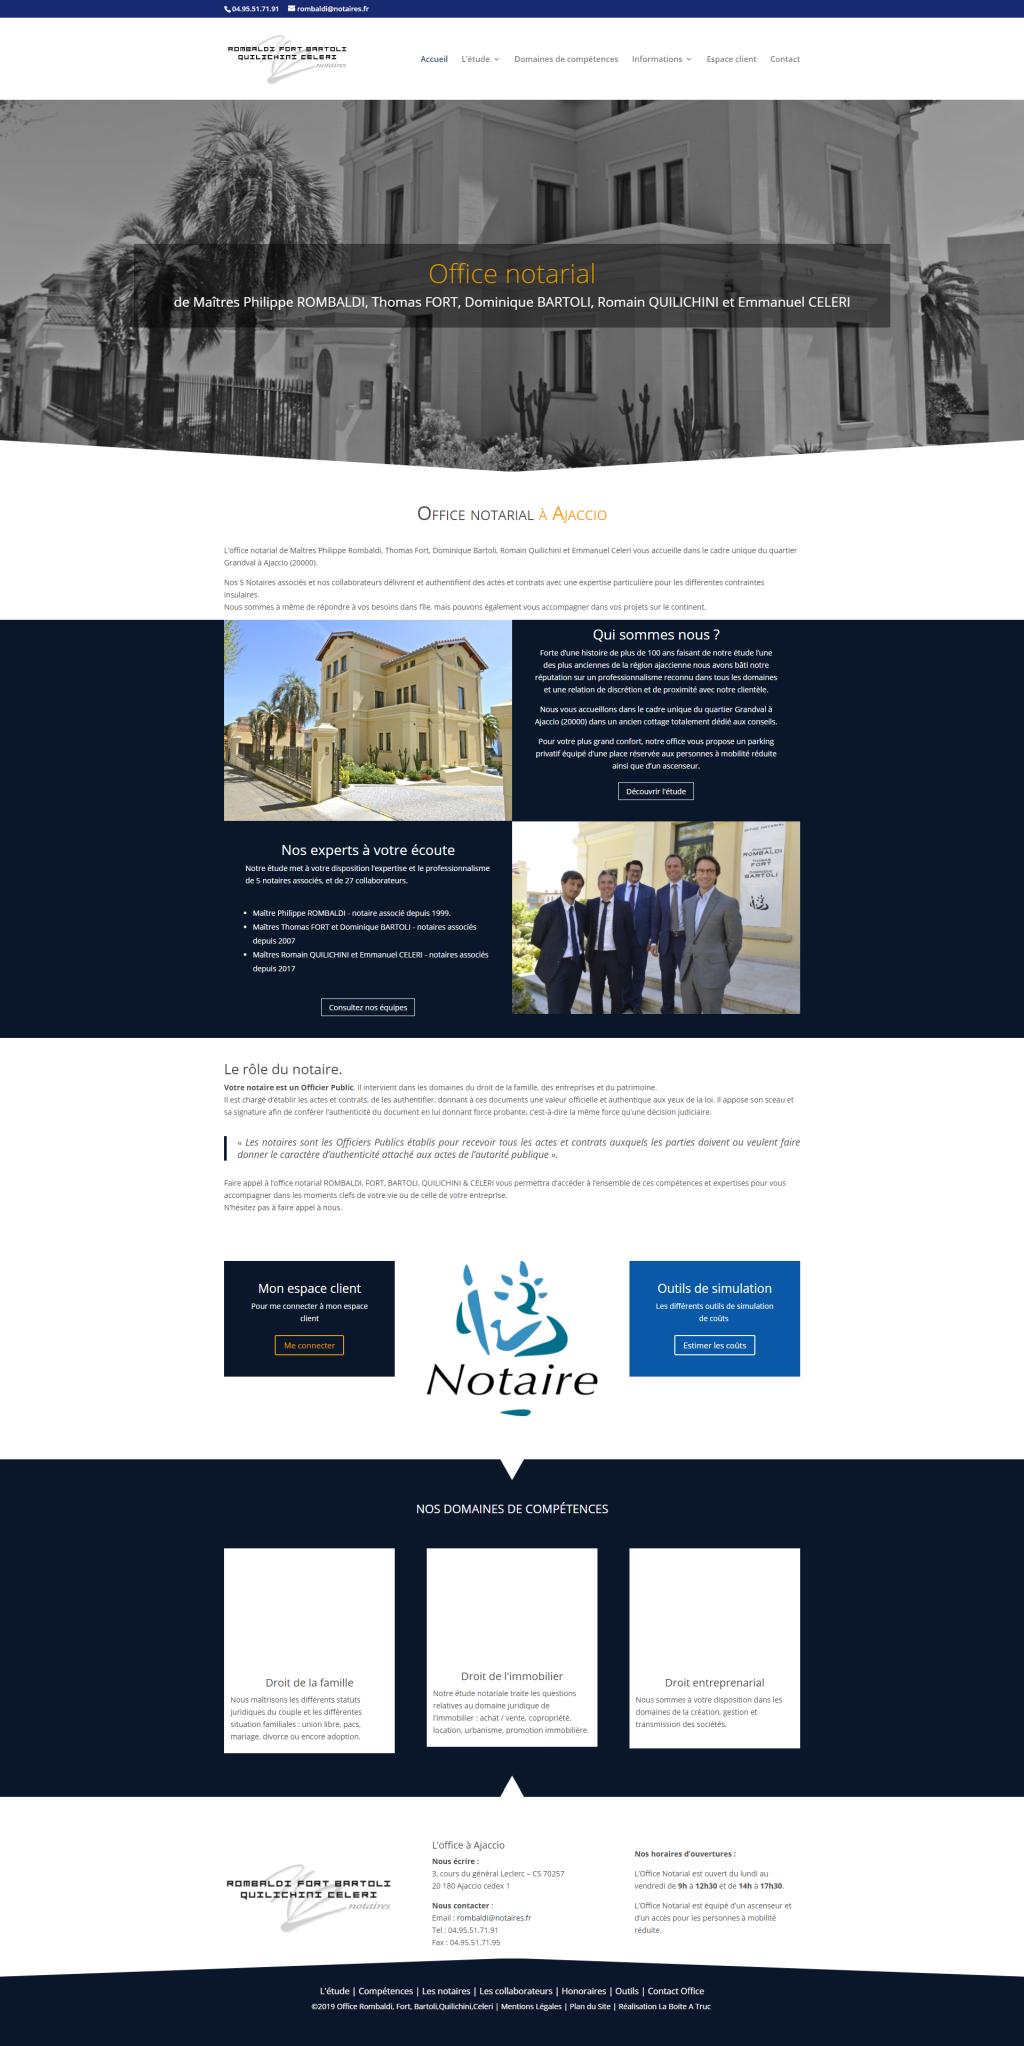 Le site de l'Office Notarial Rombaldi à Ajaccio